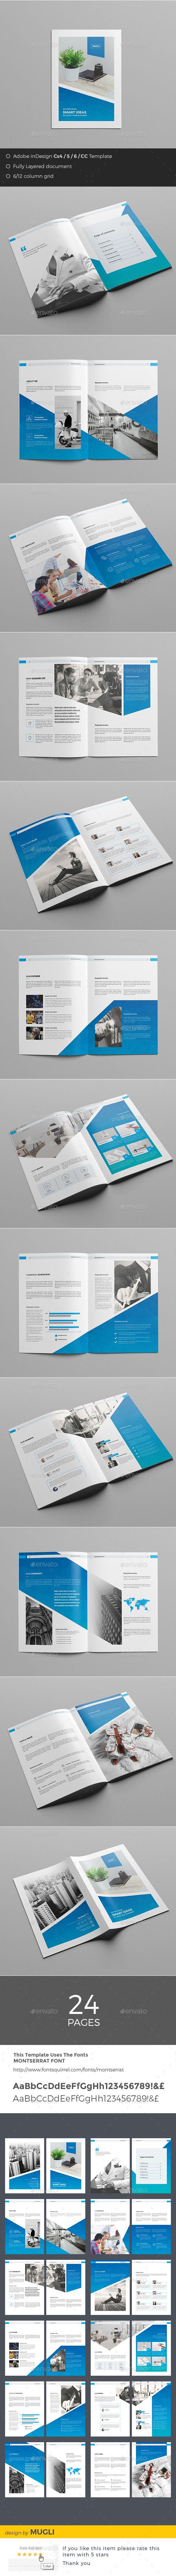 1427 best Creative & design images on Pinterest   Graph design ...